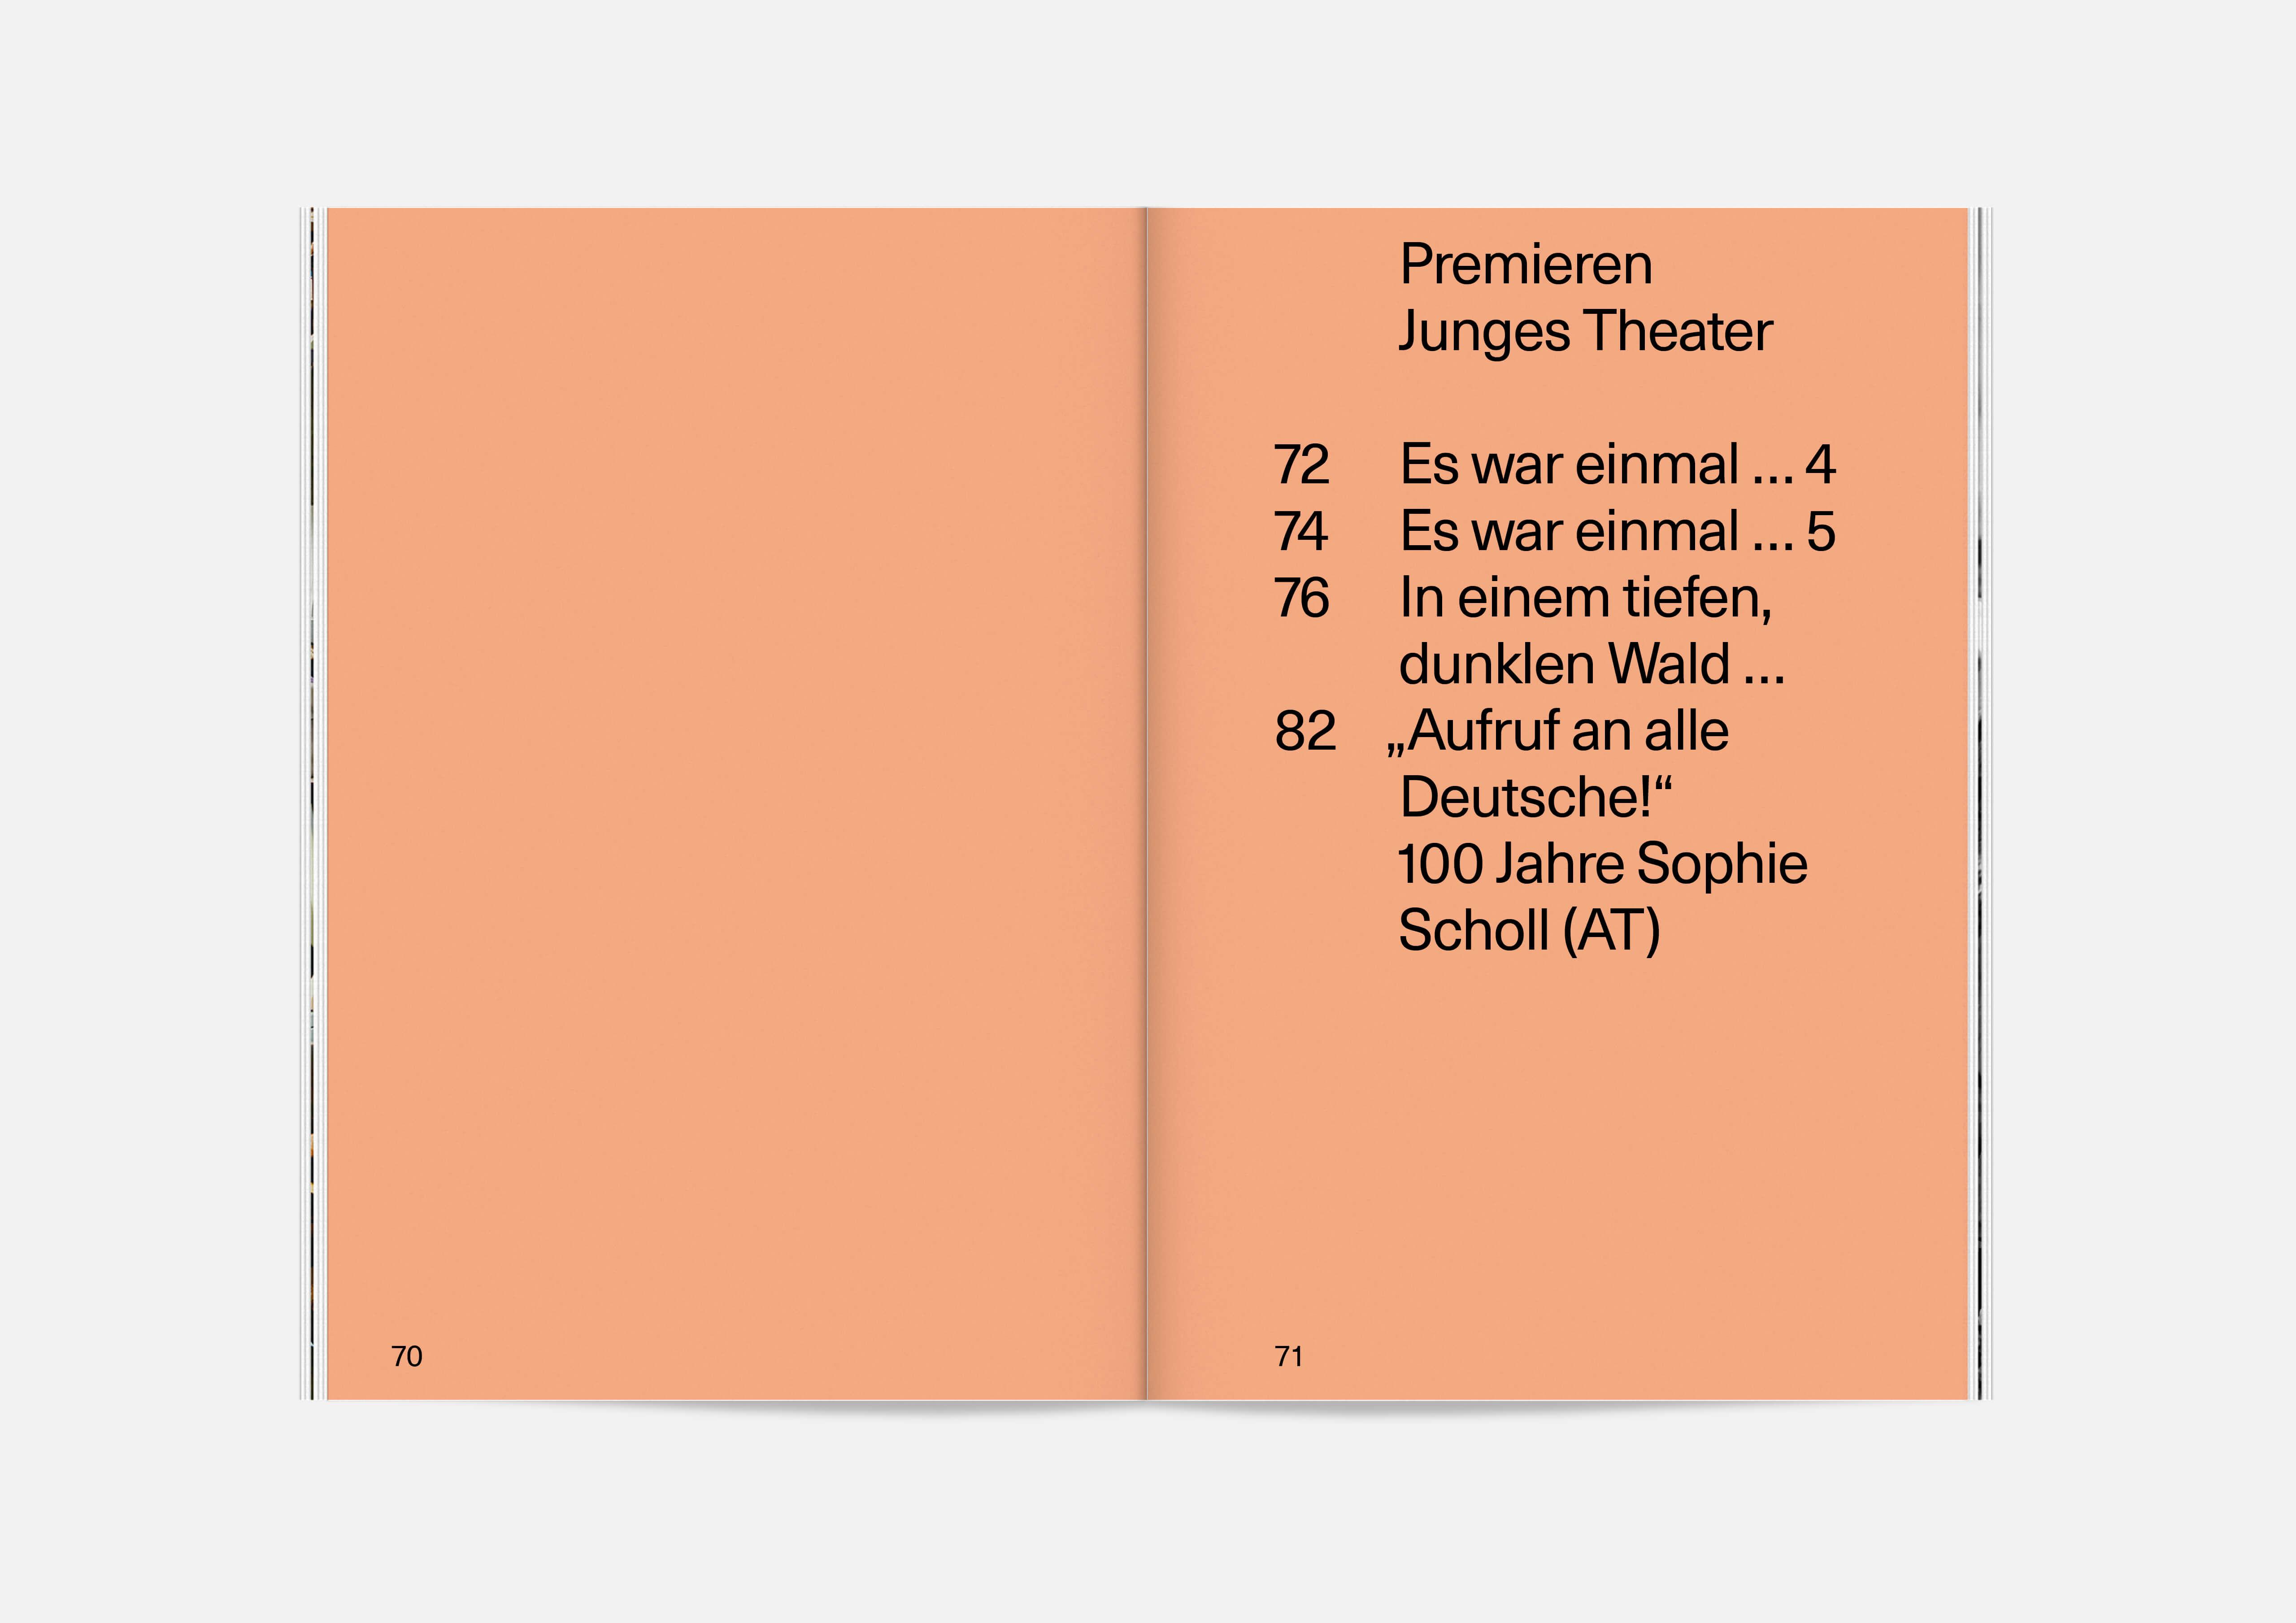 https://neuegestaltung.de/media/pages/clients/theater-erlangen-season-program-20-21/a11a2ab339-1606409613/23_te-spielzeitheft2021.jpg